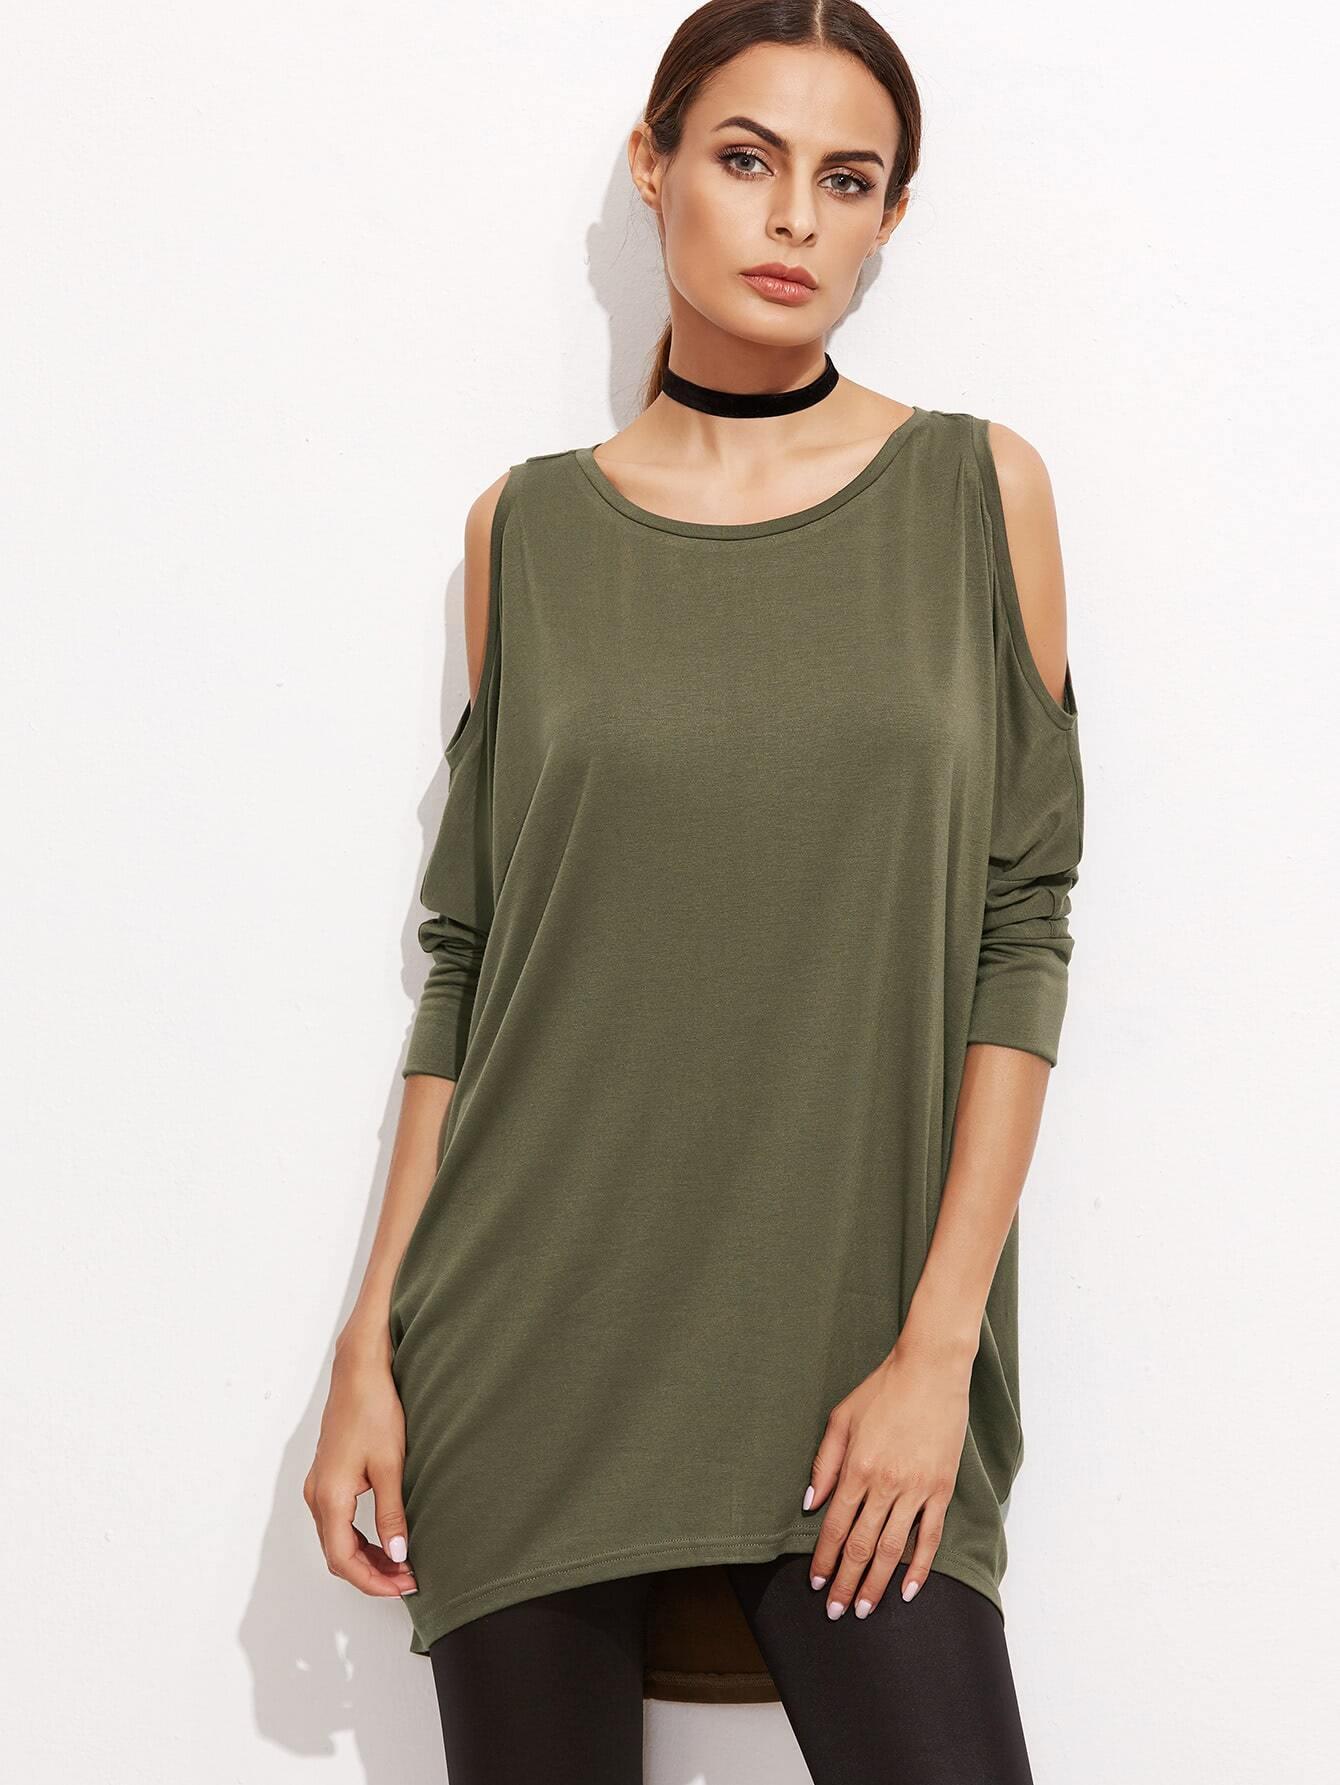 Olive Green Cold Shoulder Three Quarter Sleeve High Low DressOlive Green Cold Shoulder Three Quarter Sleeve High Low Dress<br><br>color: Army Green<br>size: L,M,S,XS